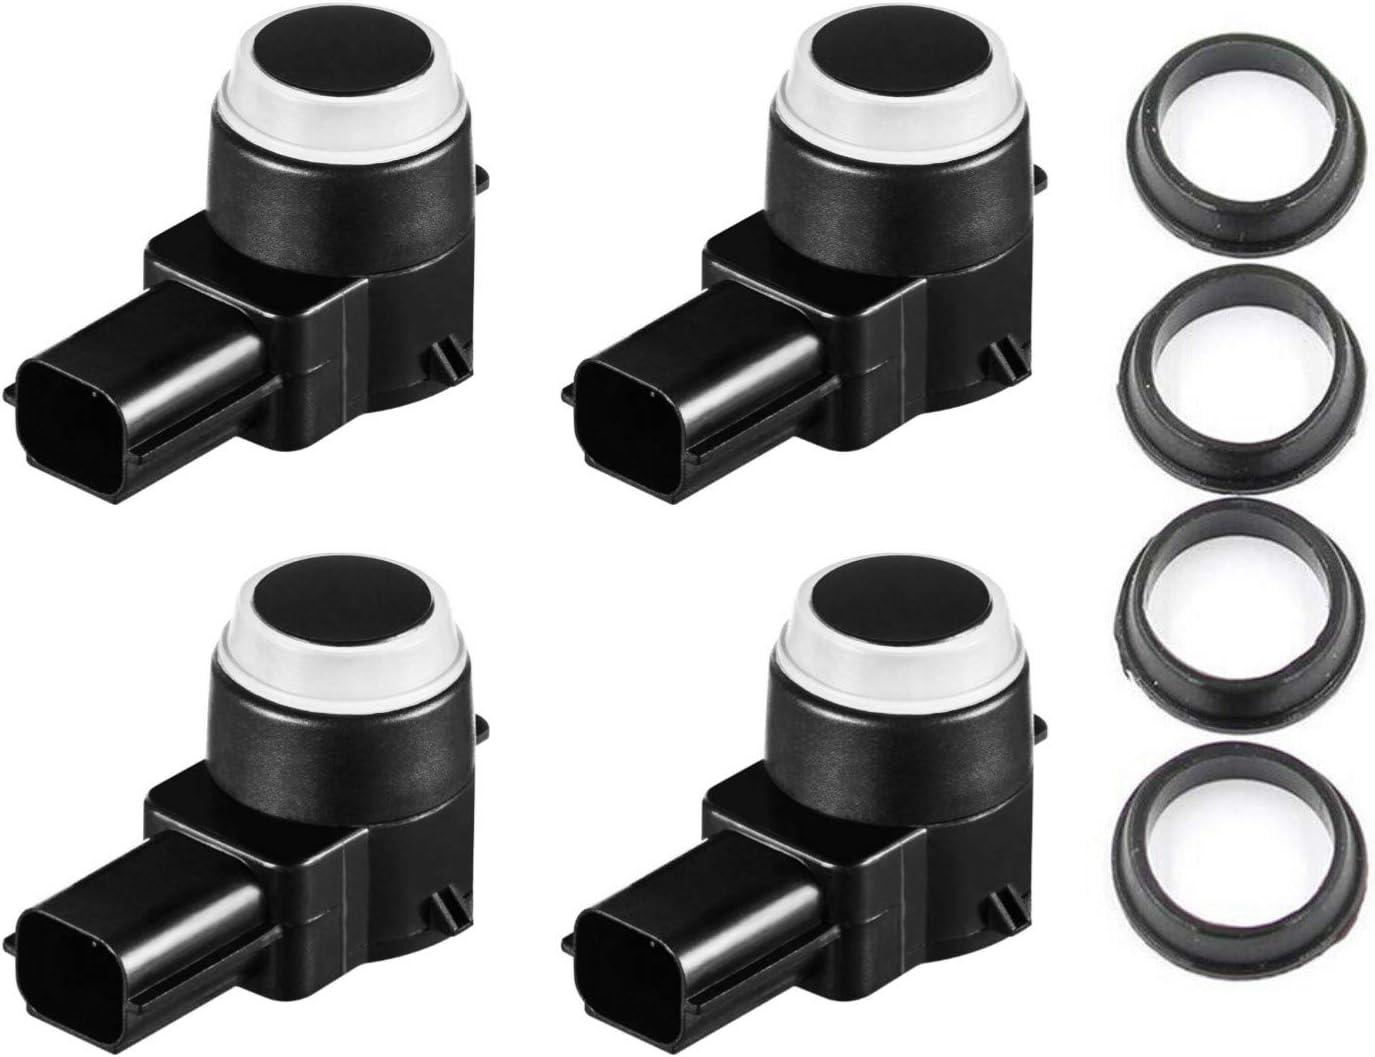 PDC Sensor Park Assist Reverse Backup Object Sensor w//Black /& Clear O-ring Fits Rear Bumper On Select 2006-2017 GM Vehicles Replaces OEM 15239247 25962147 1